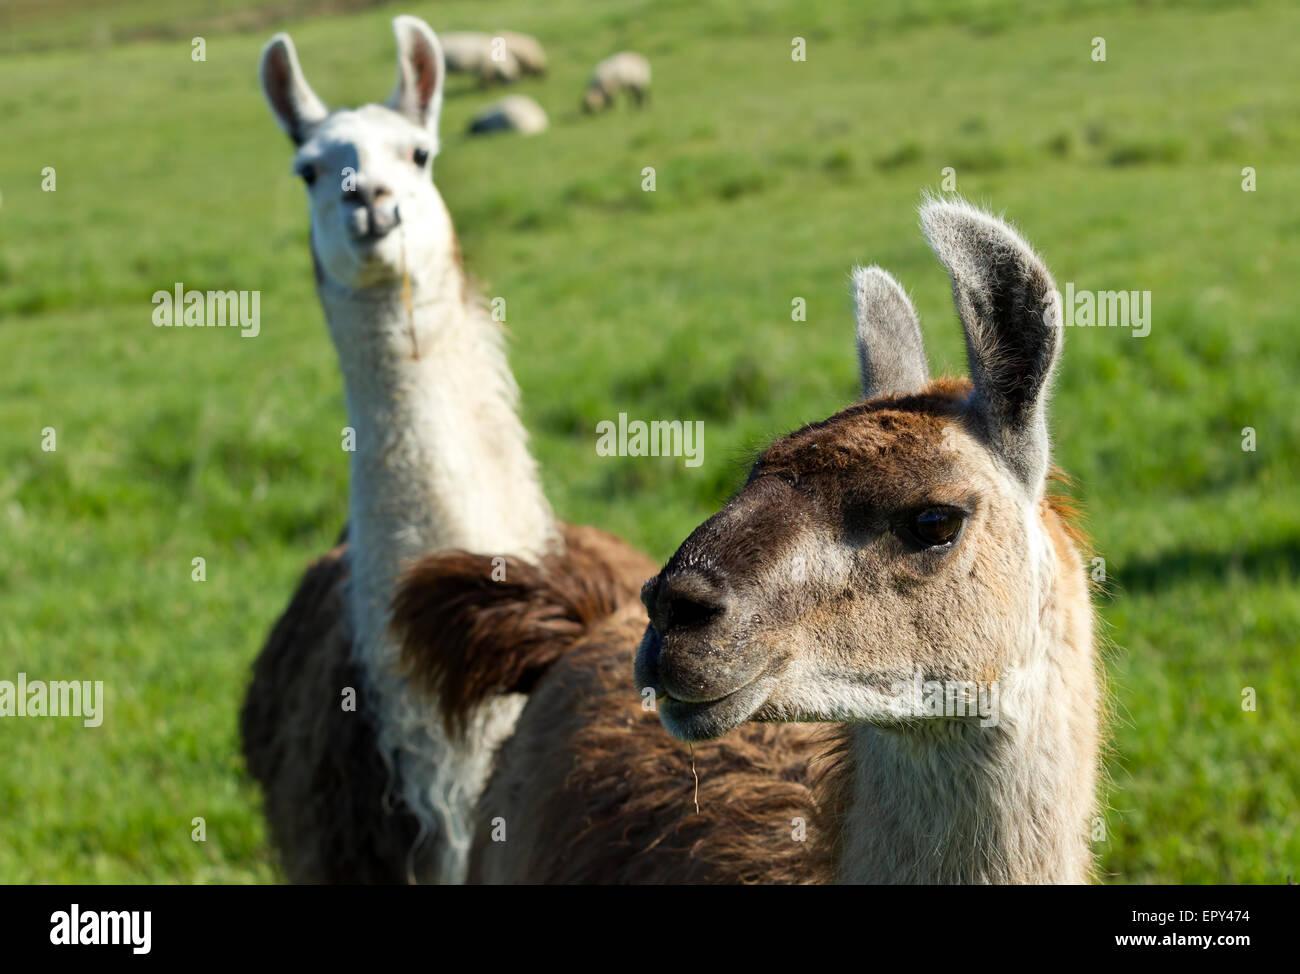 Another Llama photo bomb. - Stock Image